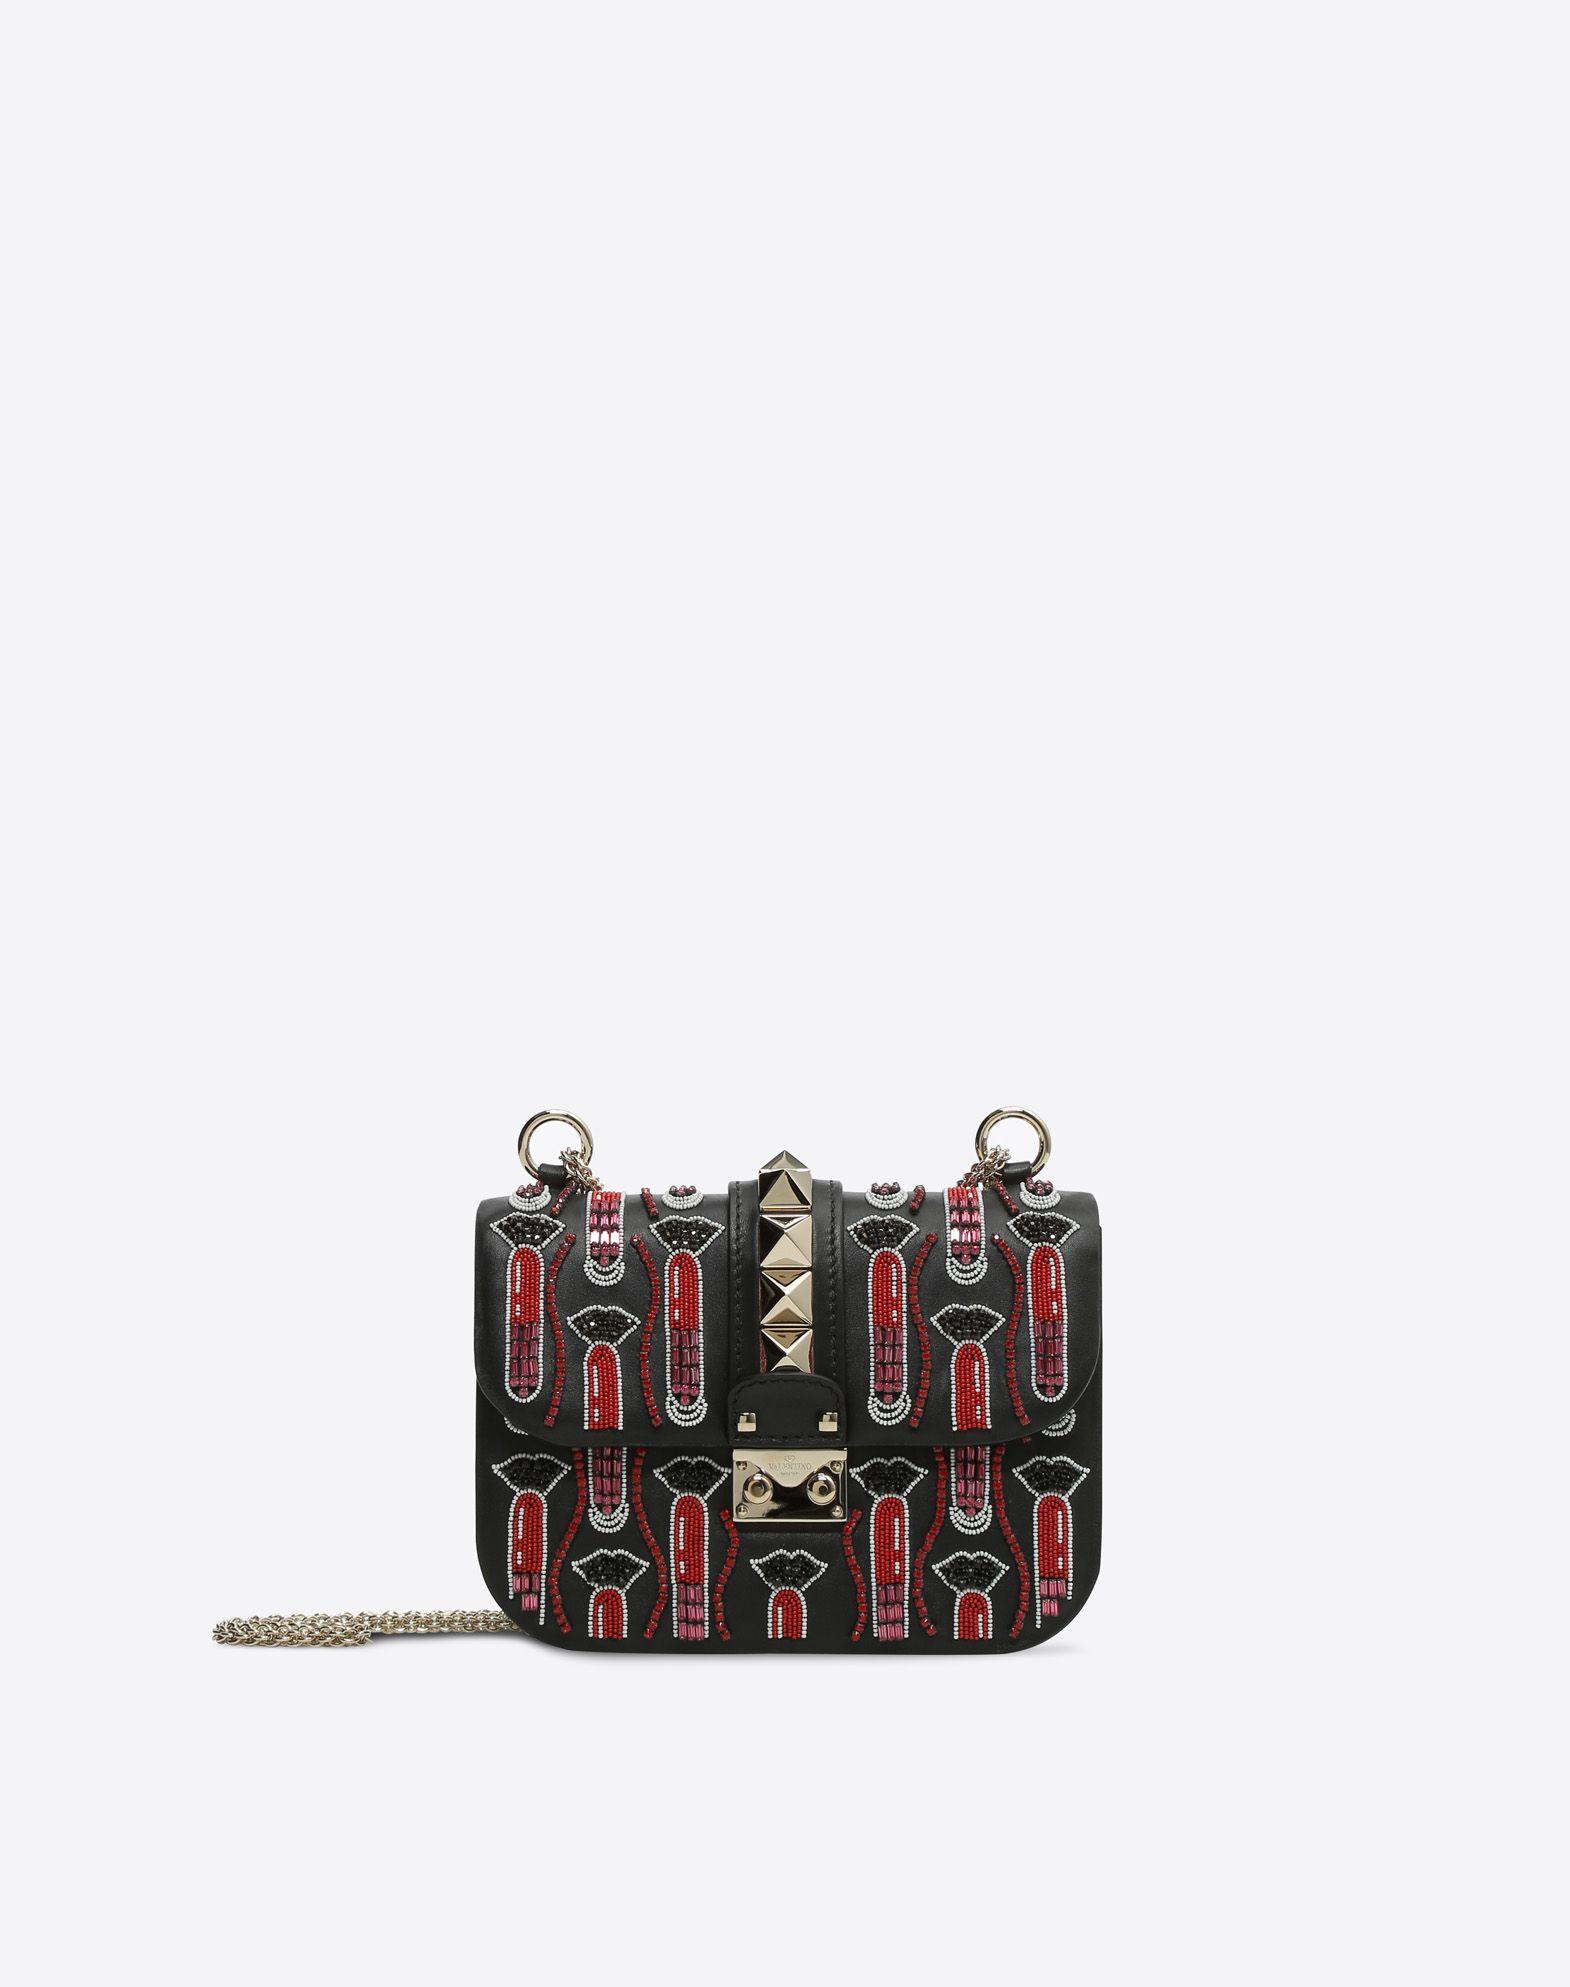 VALENTINO 附品牌标志 水钻 钉珠 锁扣固定 内部拉链口袋  45381218wr